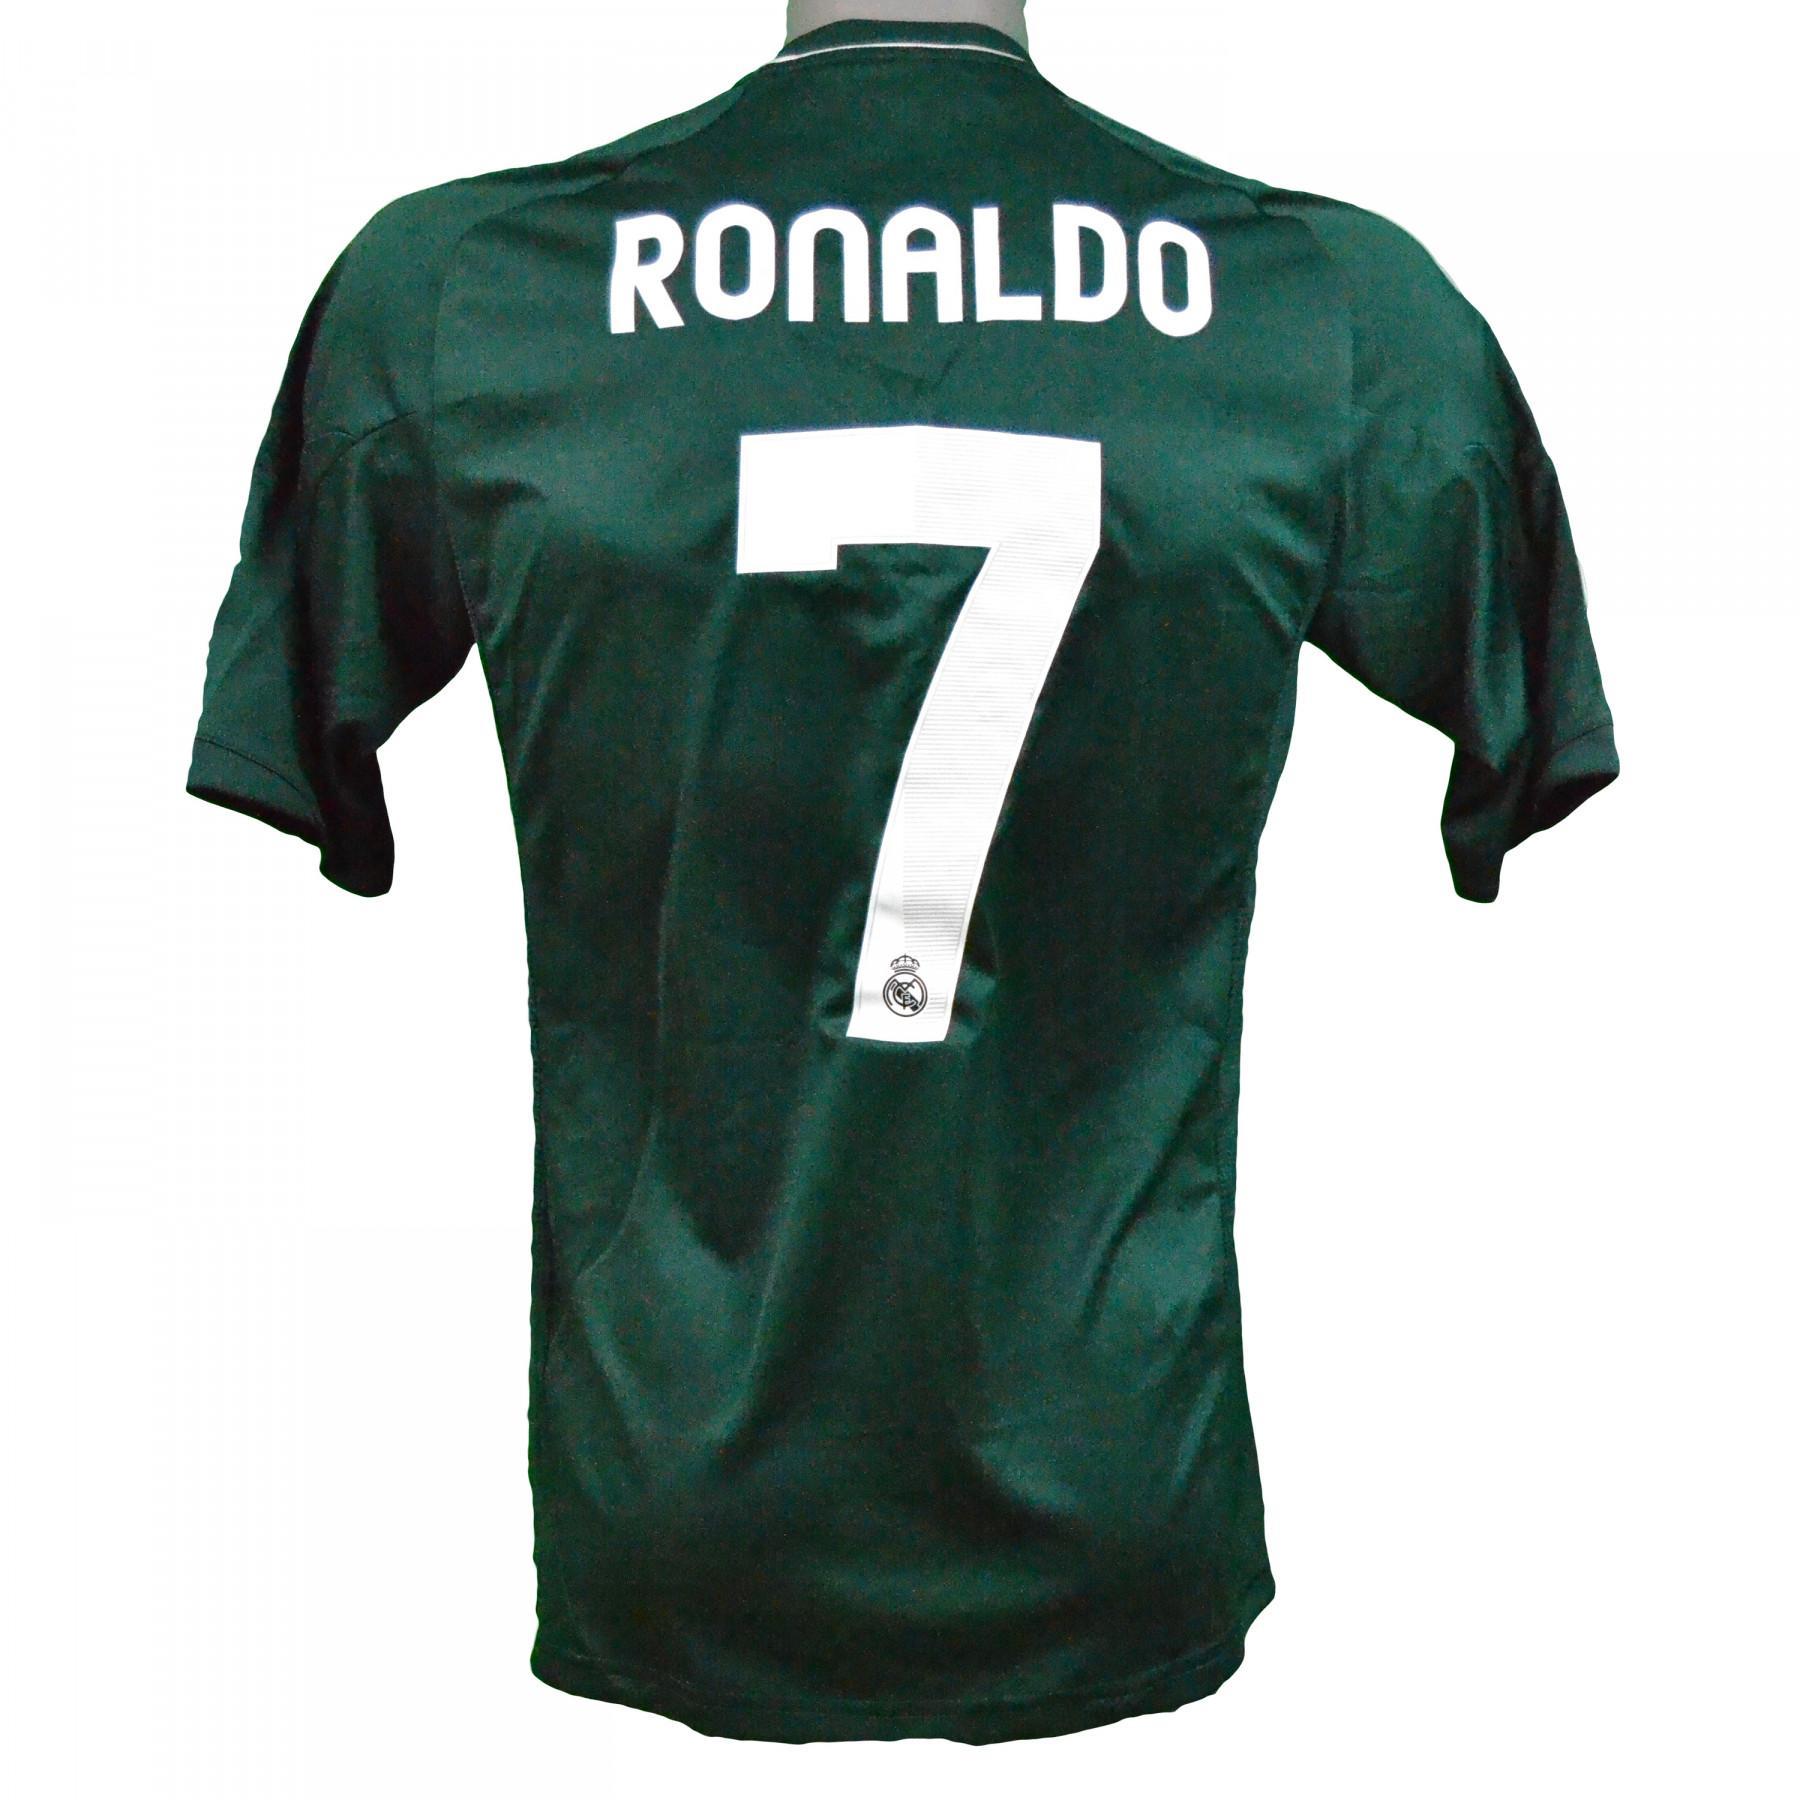 third jersey Real Madrid Ronaldo 2012/2013